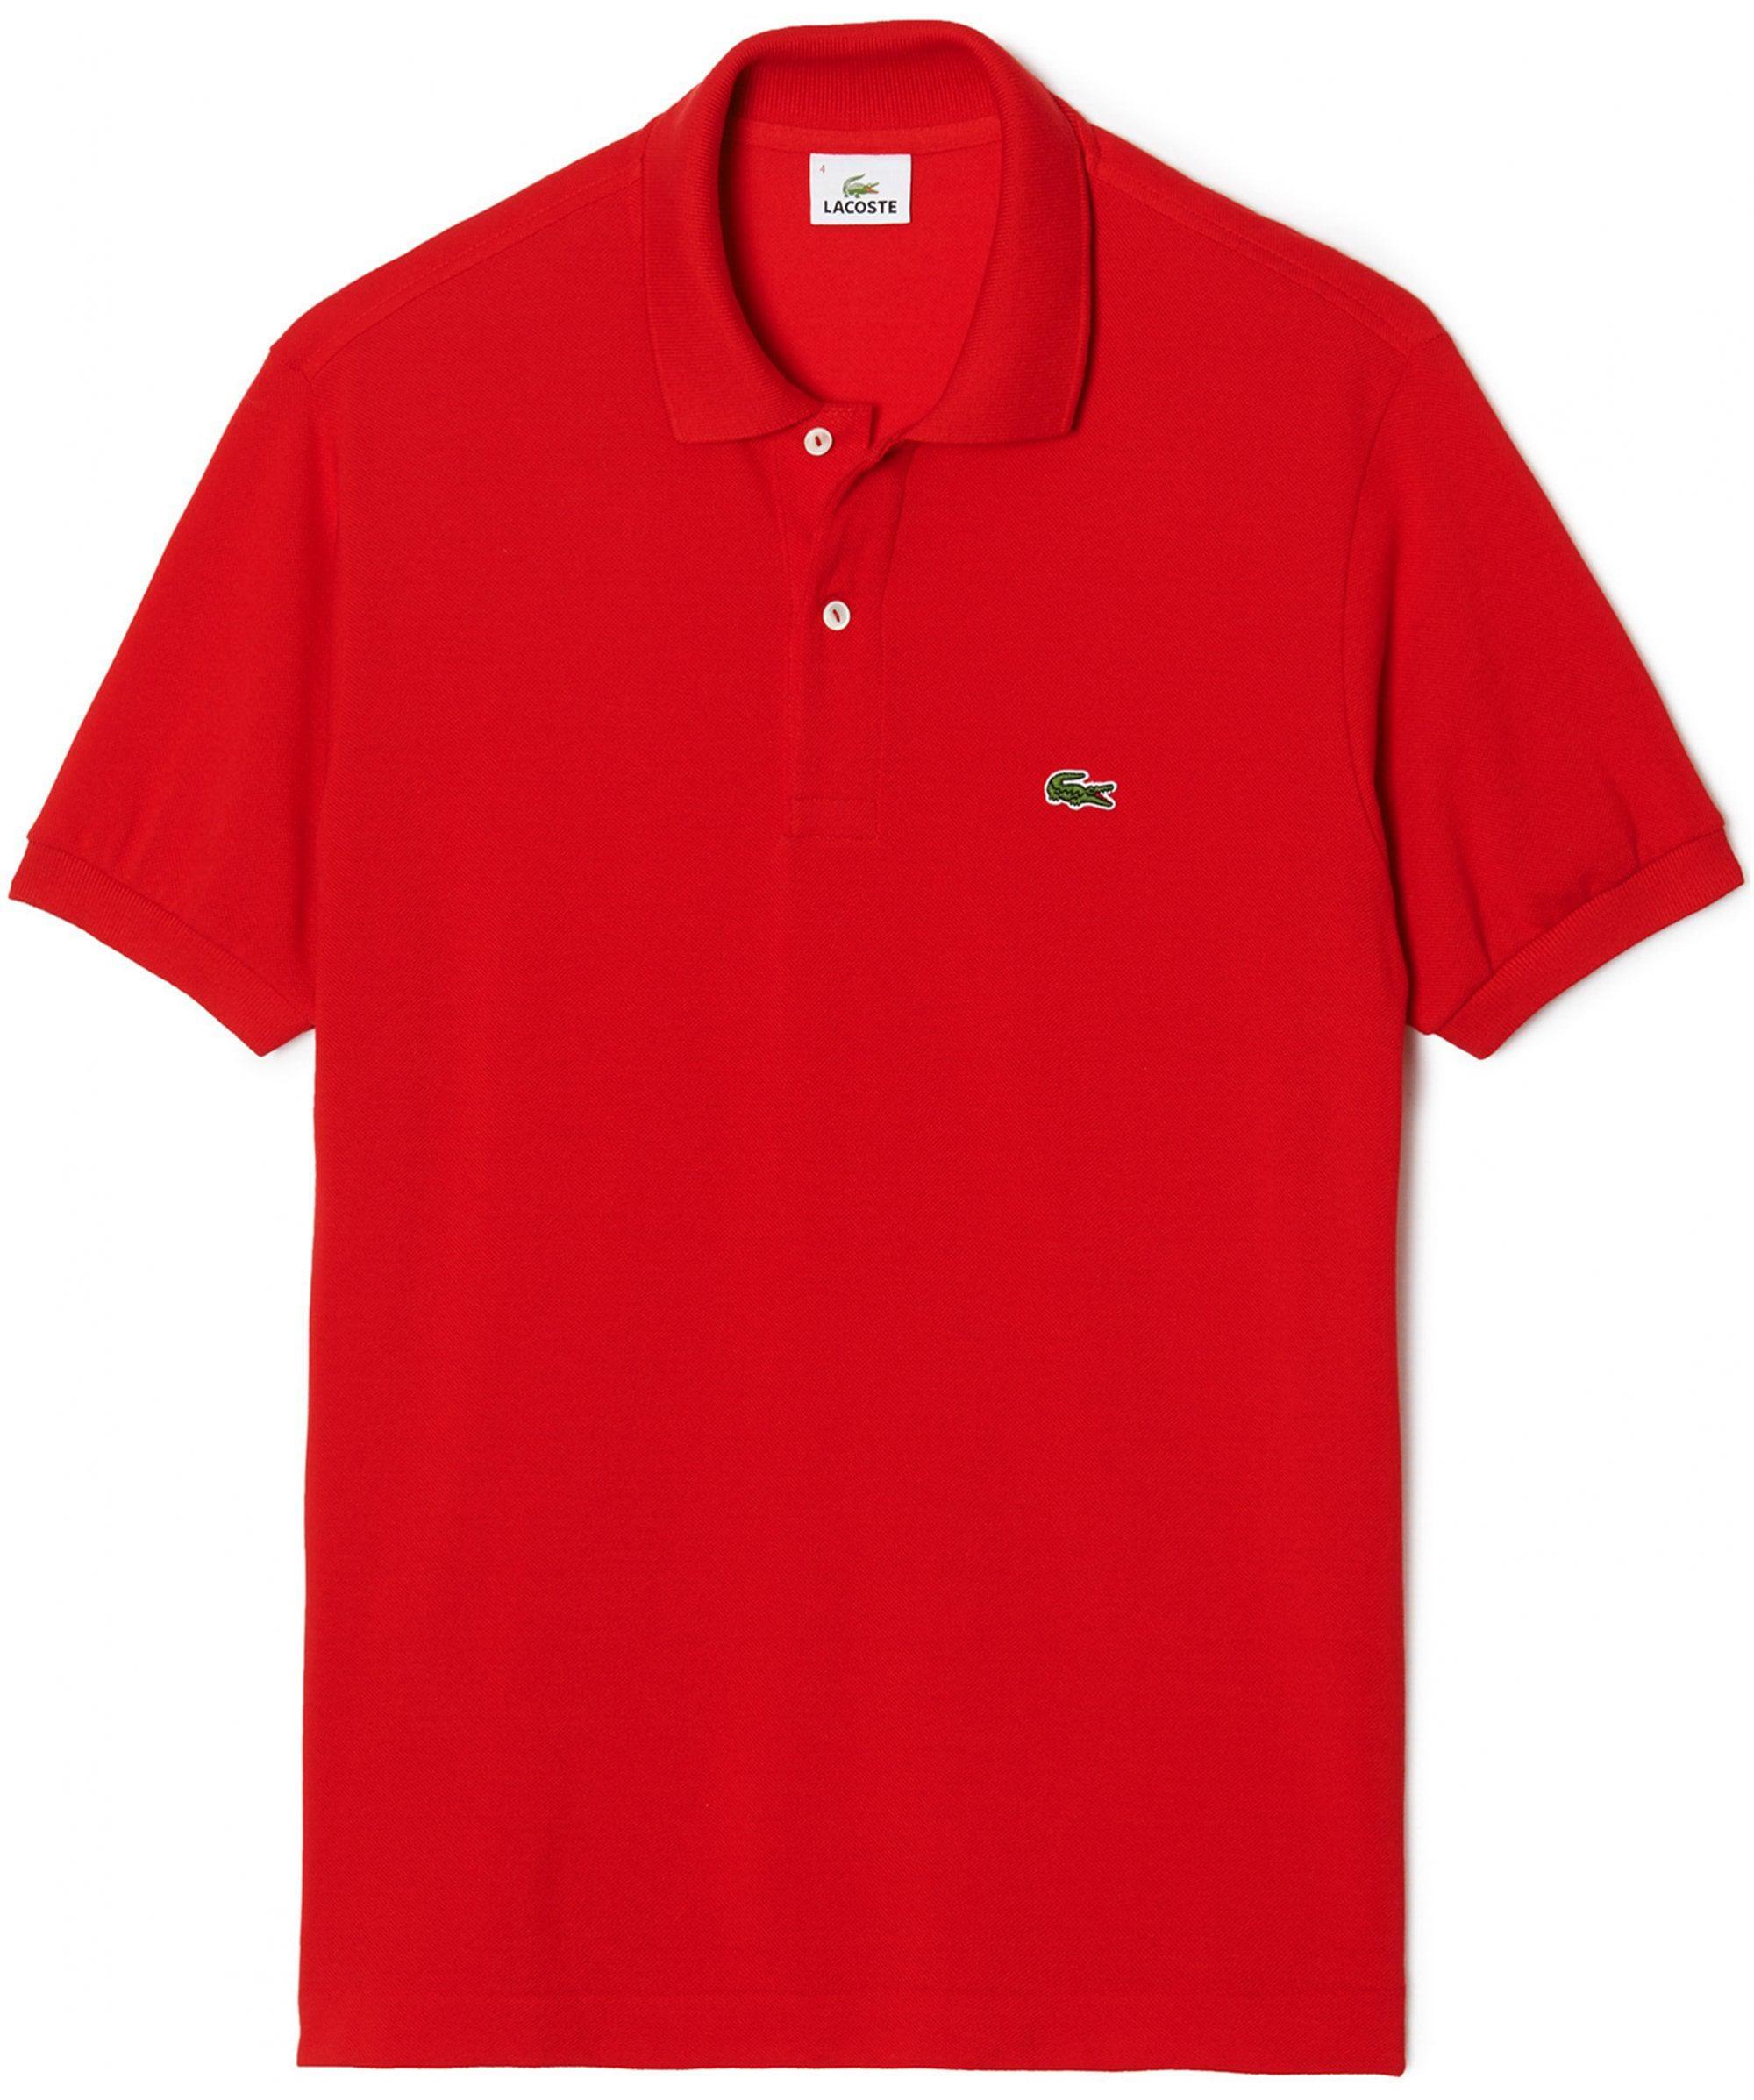 a34054ead9e482 Lacoste - Red Classic Fit Pique Cotton Polo Shirt for Men - Lyst. View  fullscreen